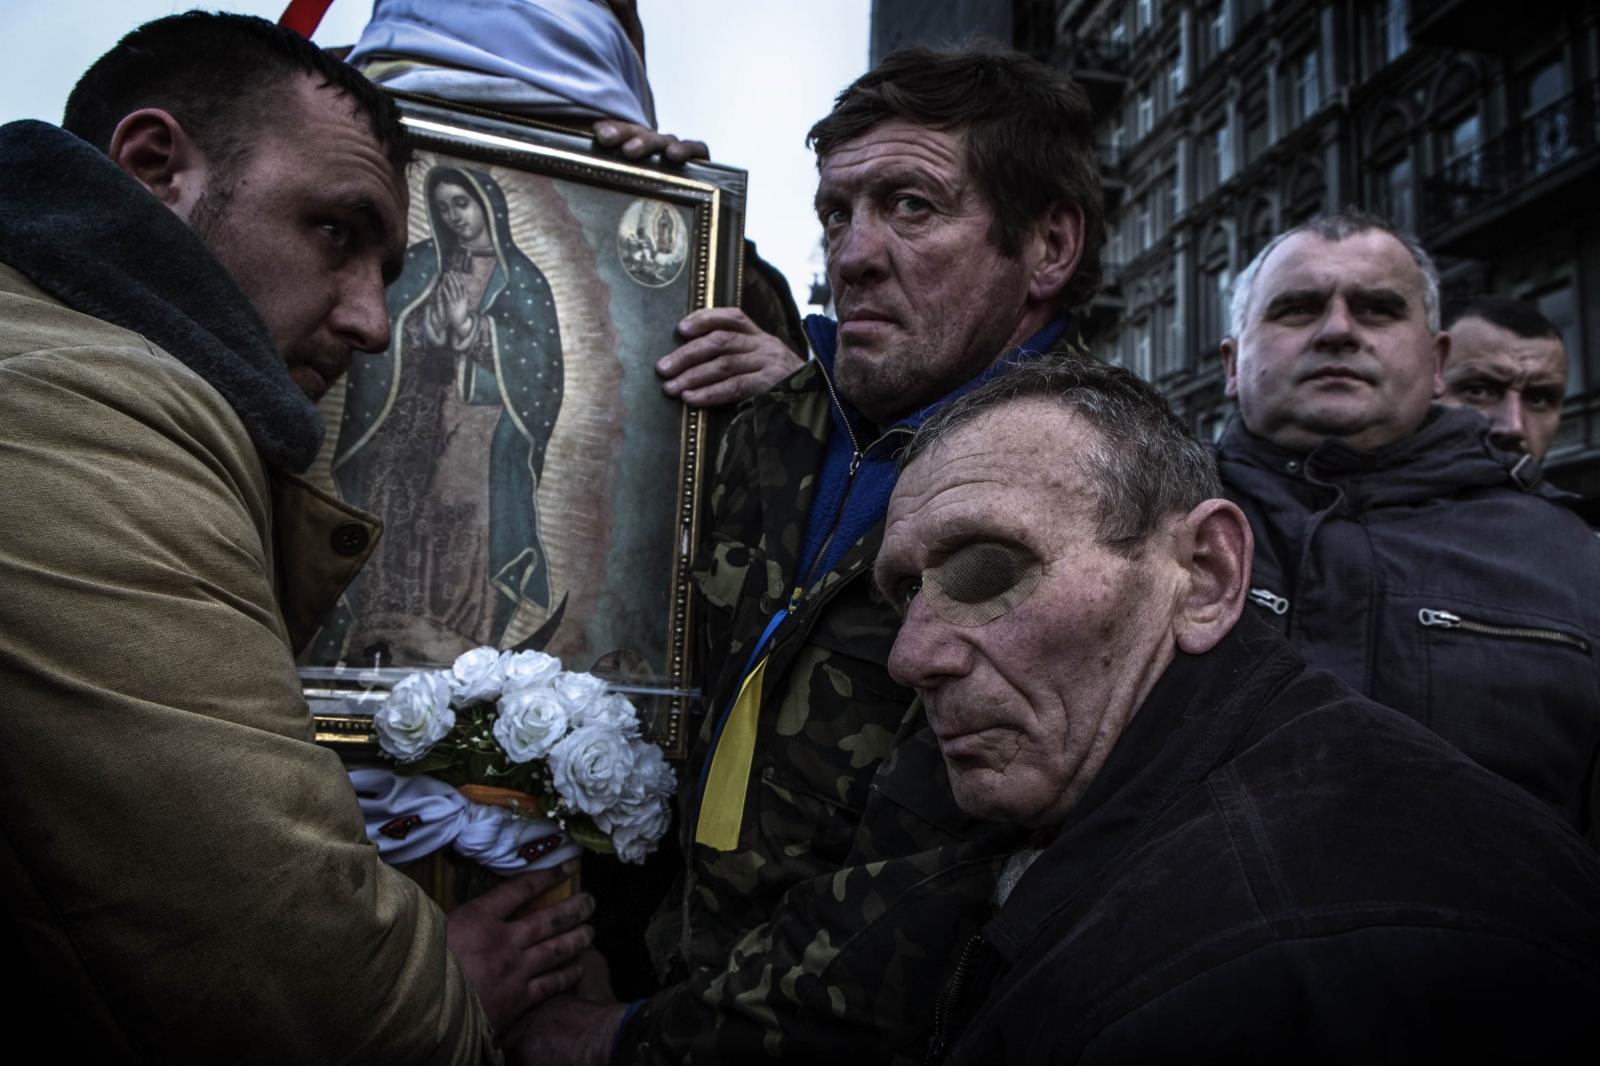 Art and Documentary Photography - Loading Behind_Kiev_s_barricades_100.jpg